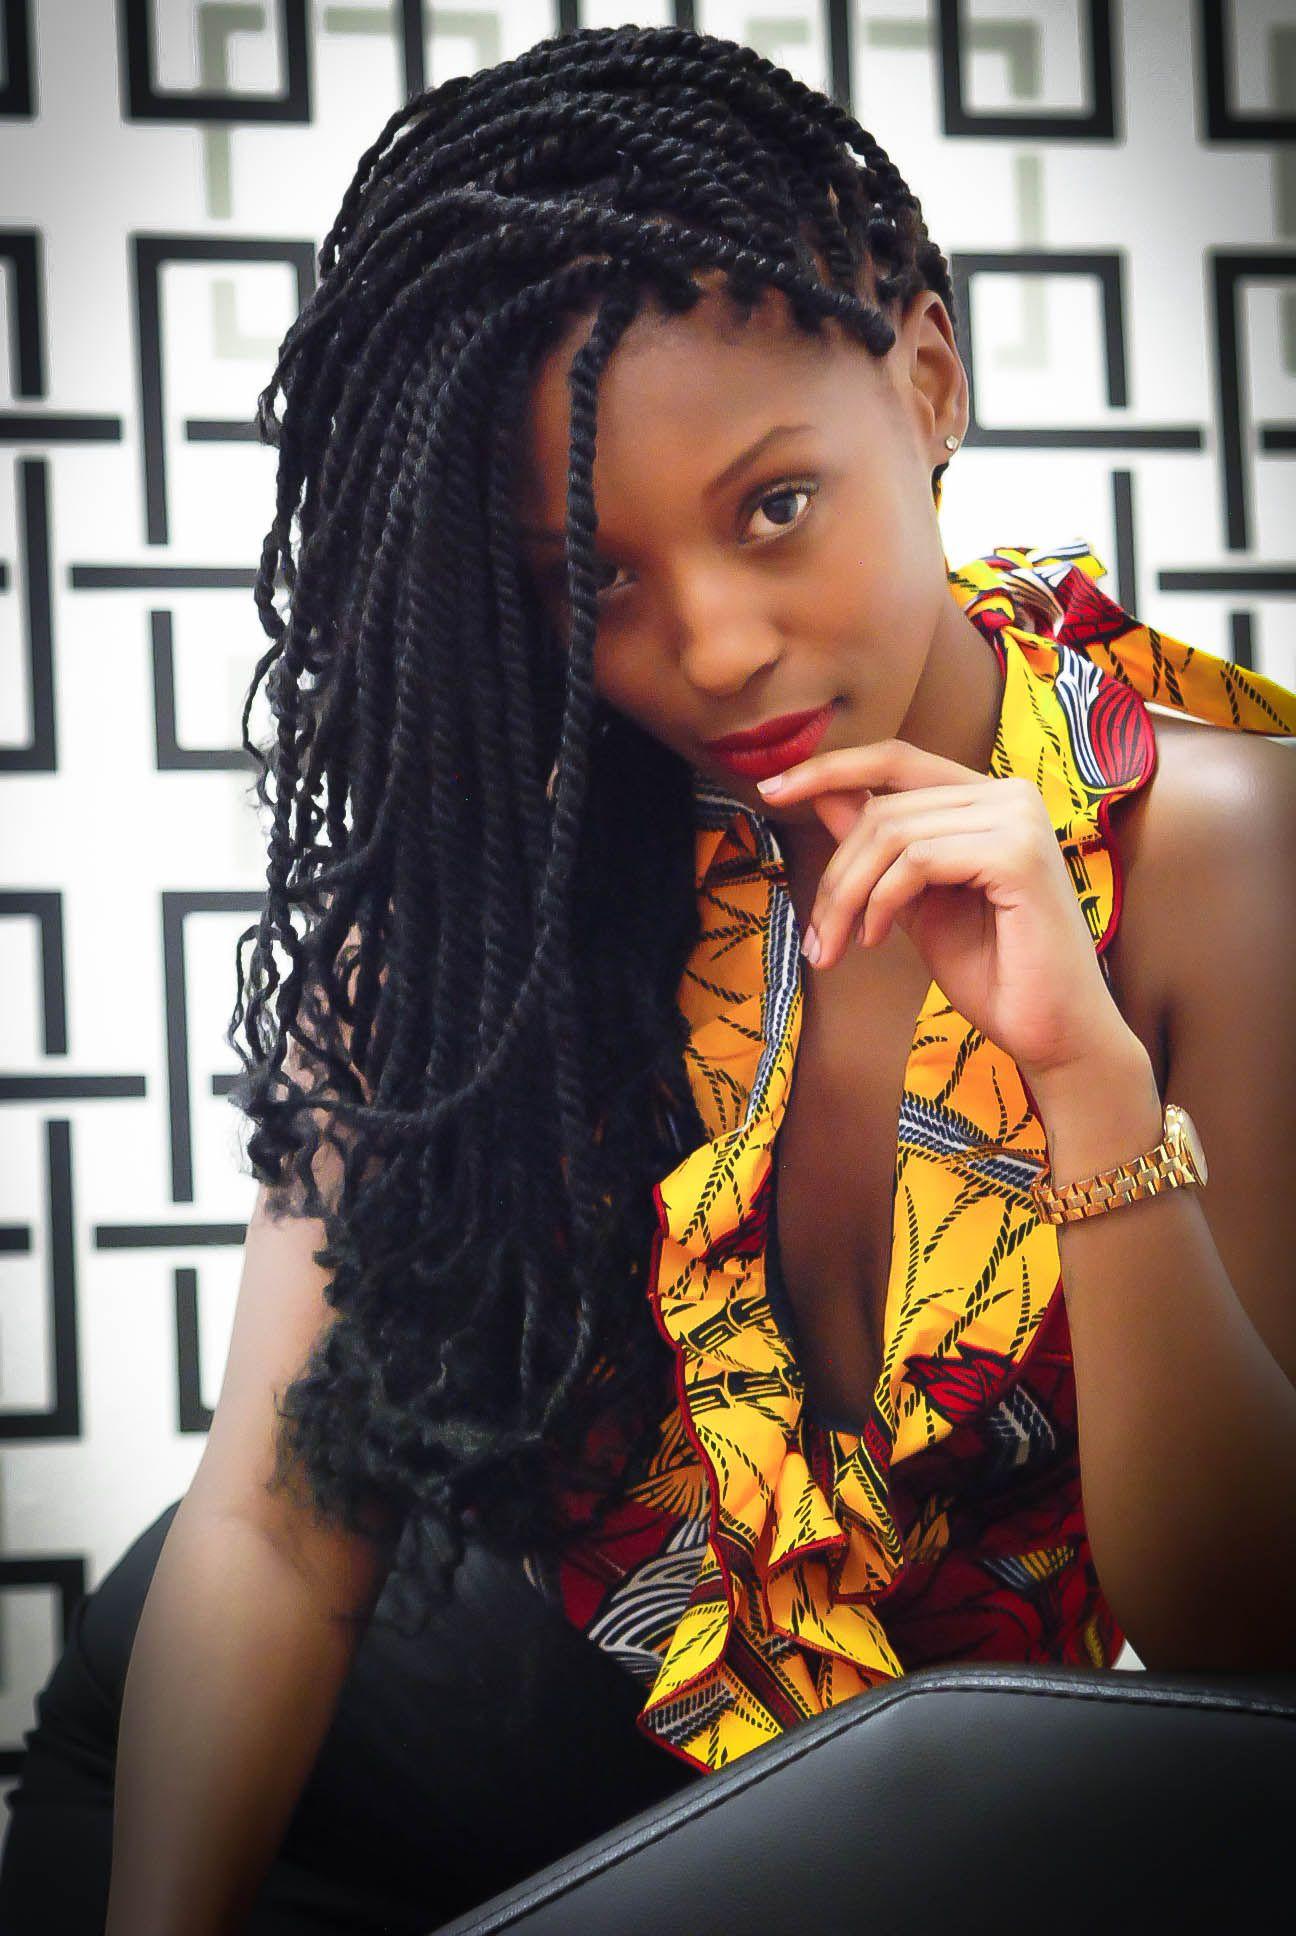 marley twist 6 - senegalese twists charlotte nc   unisex